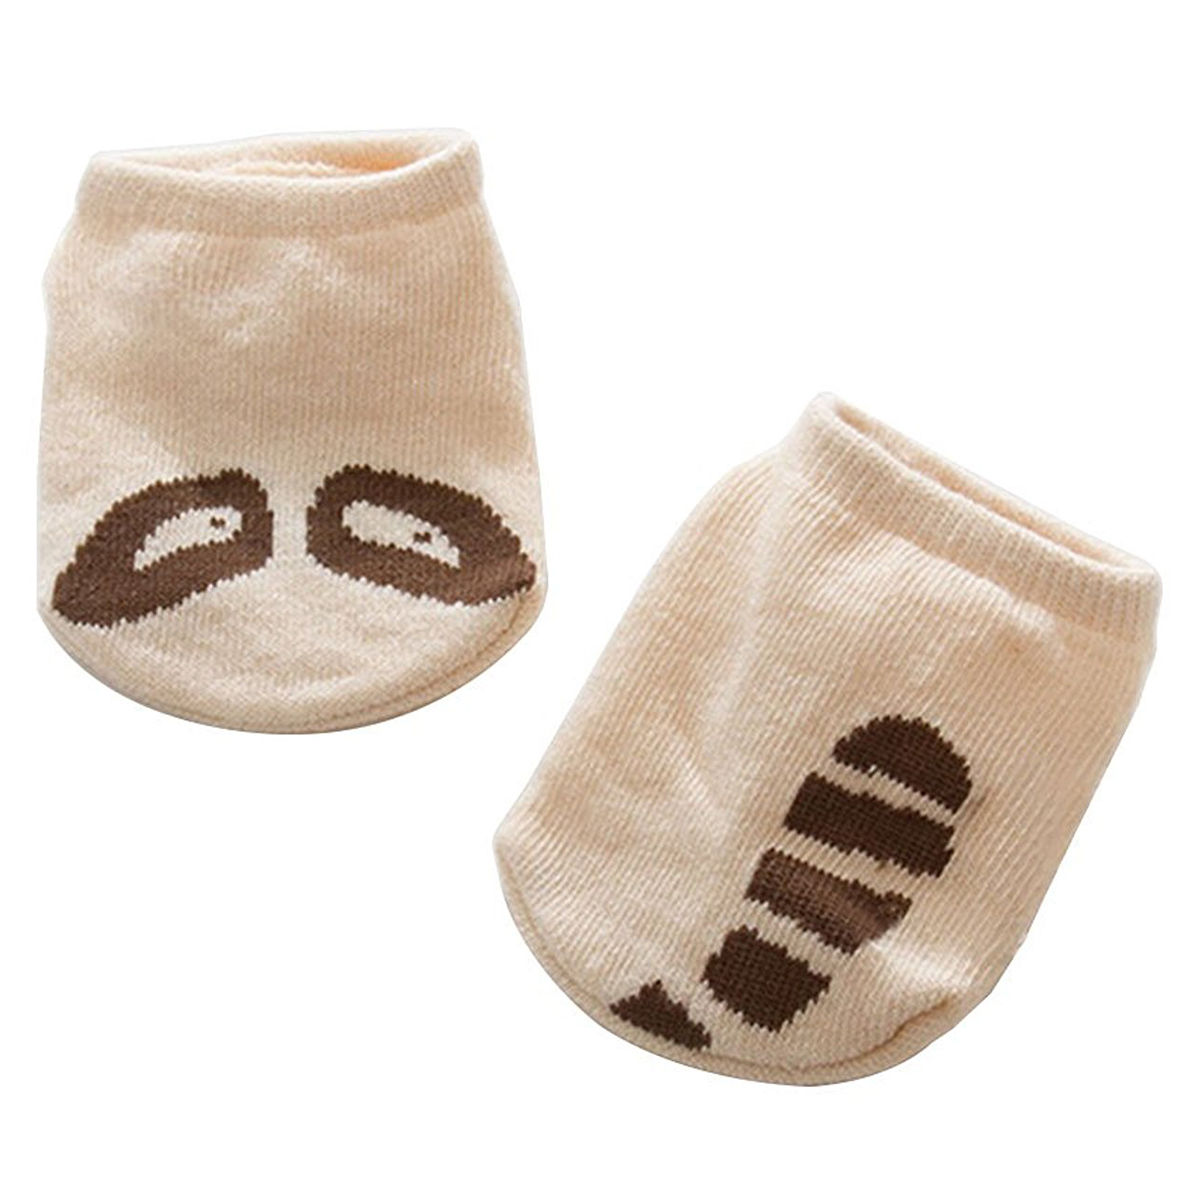 HOT SALE KACAKID Baby Girls Boys Cute Cartoon Socks Newborn Infant Cotton Socks Beige